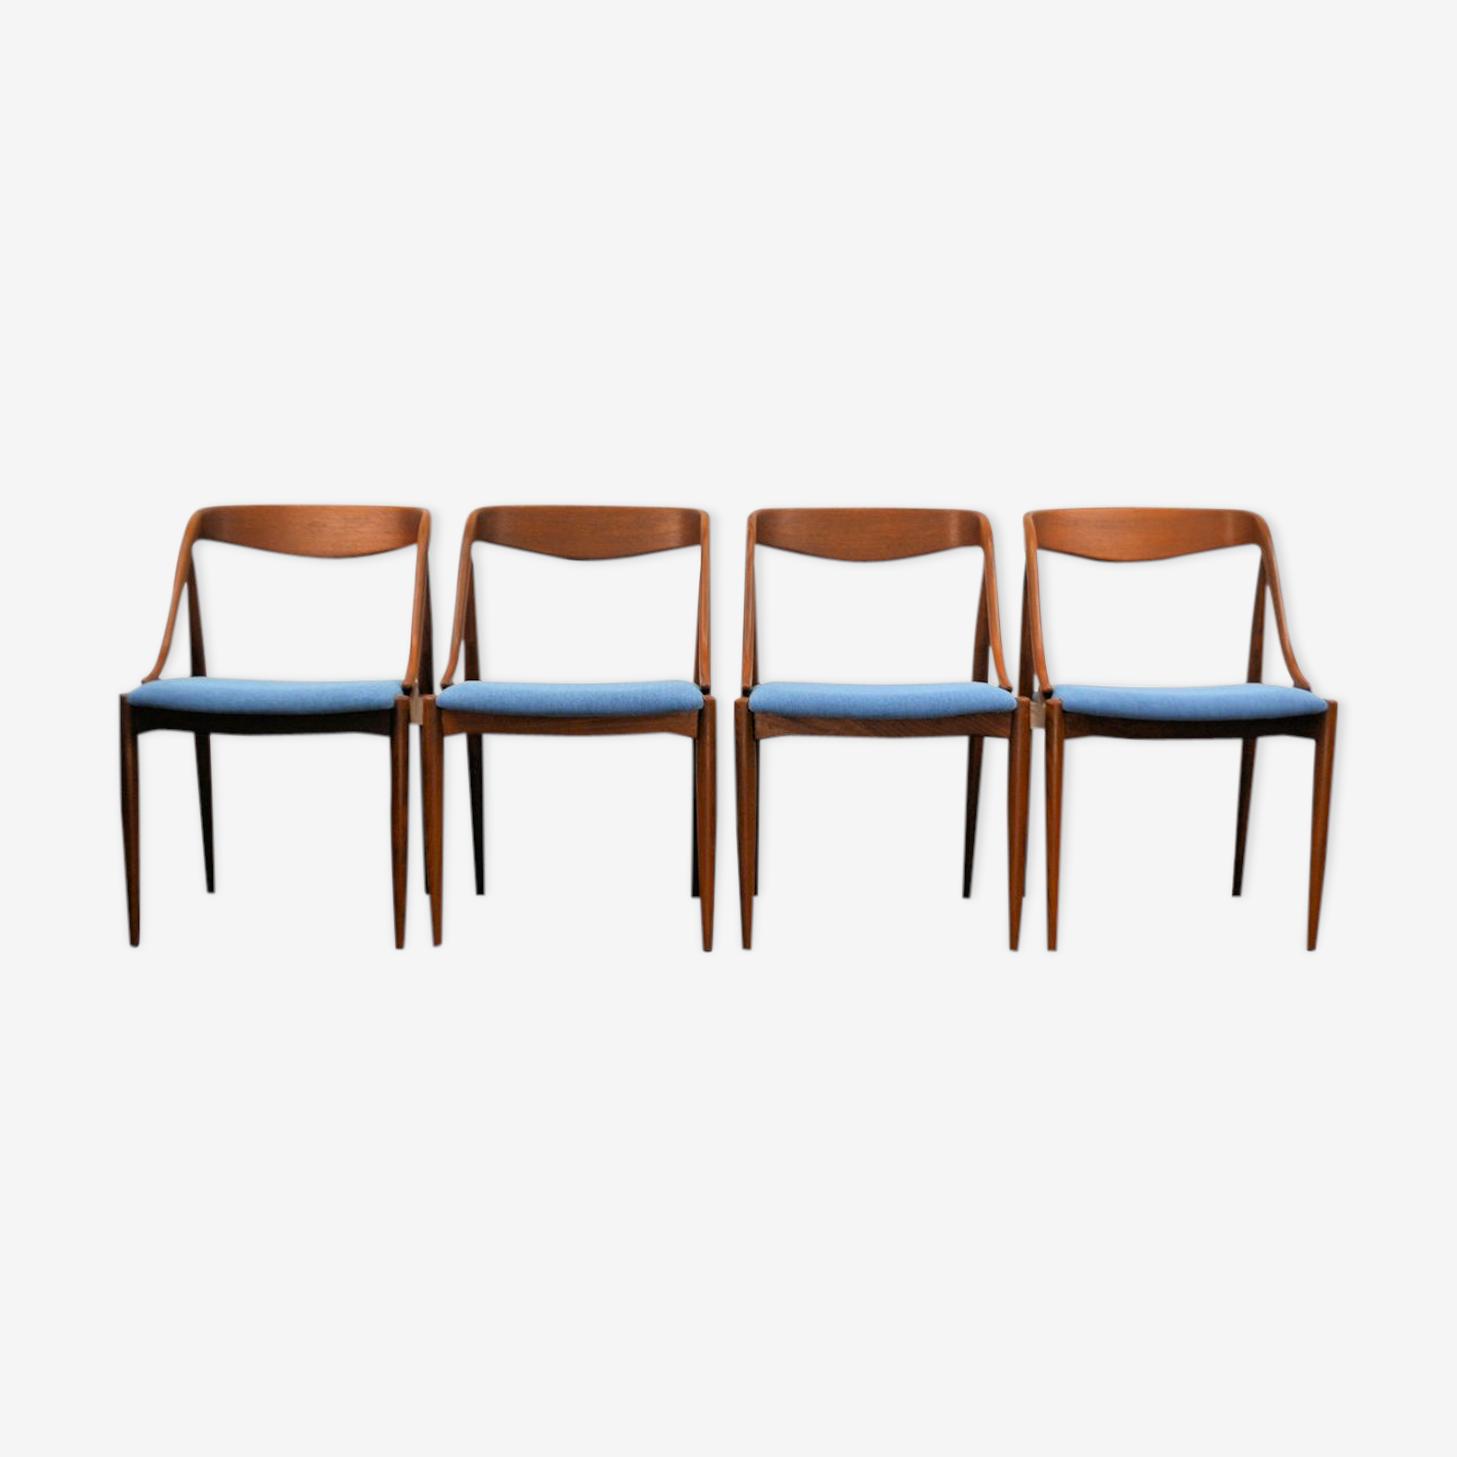 Chaises vintage teck Johannes Andersen